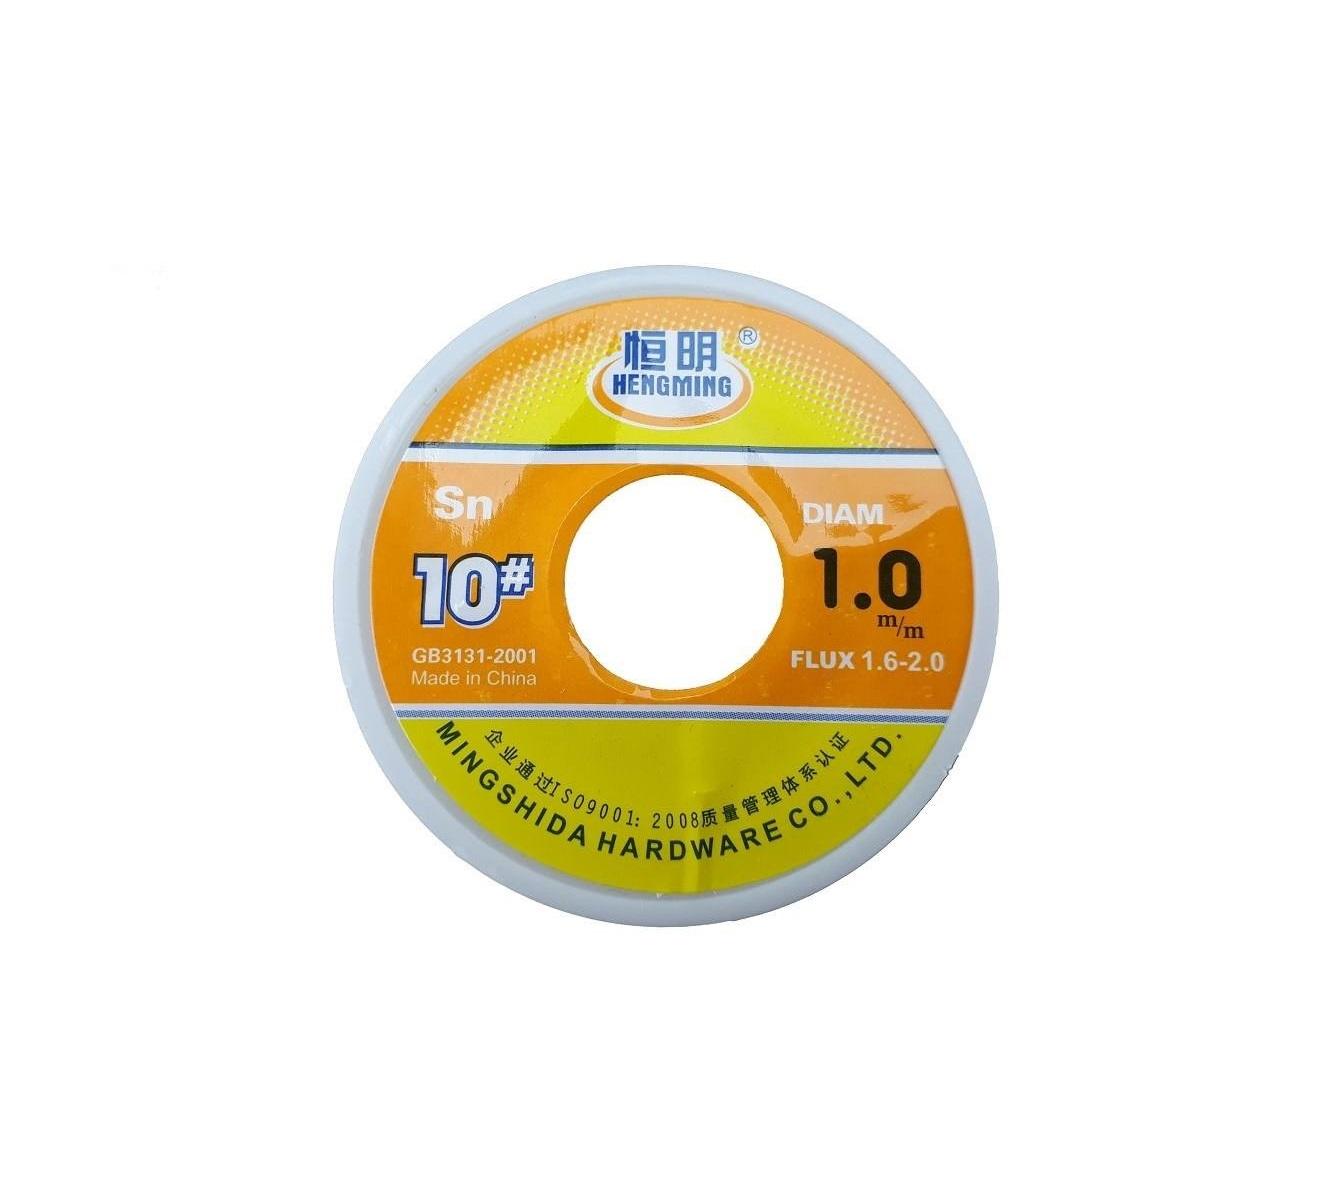 سیم لحیم - 100GM